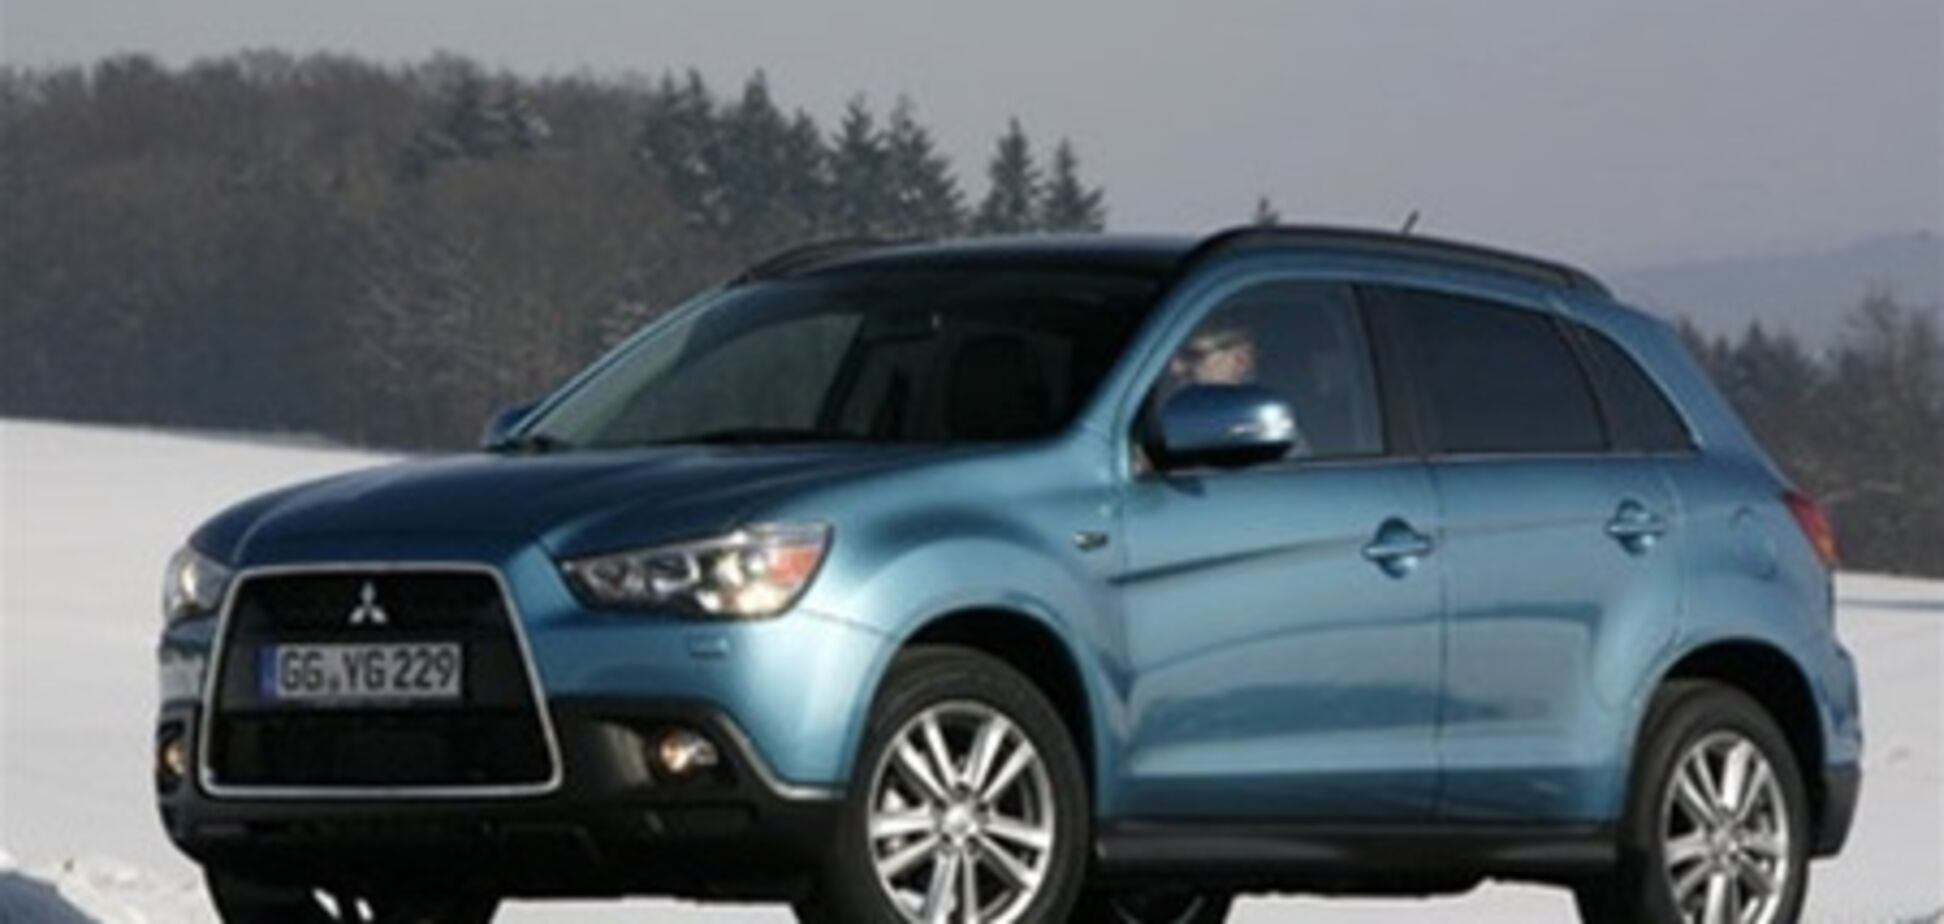 СМИ настаивают: из бюджета Киева дали деньги на Mitsubishi. Фотофакт